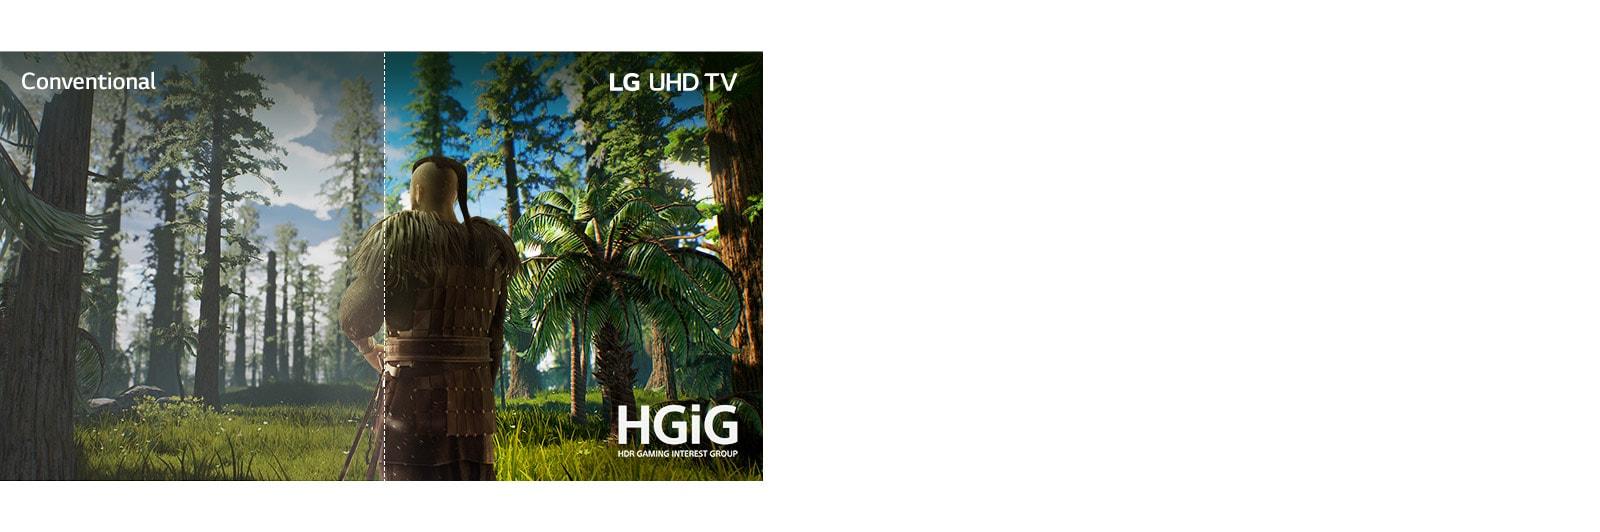 LG 65UN7300PTC HGiG profile